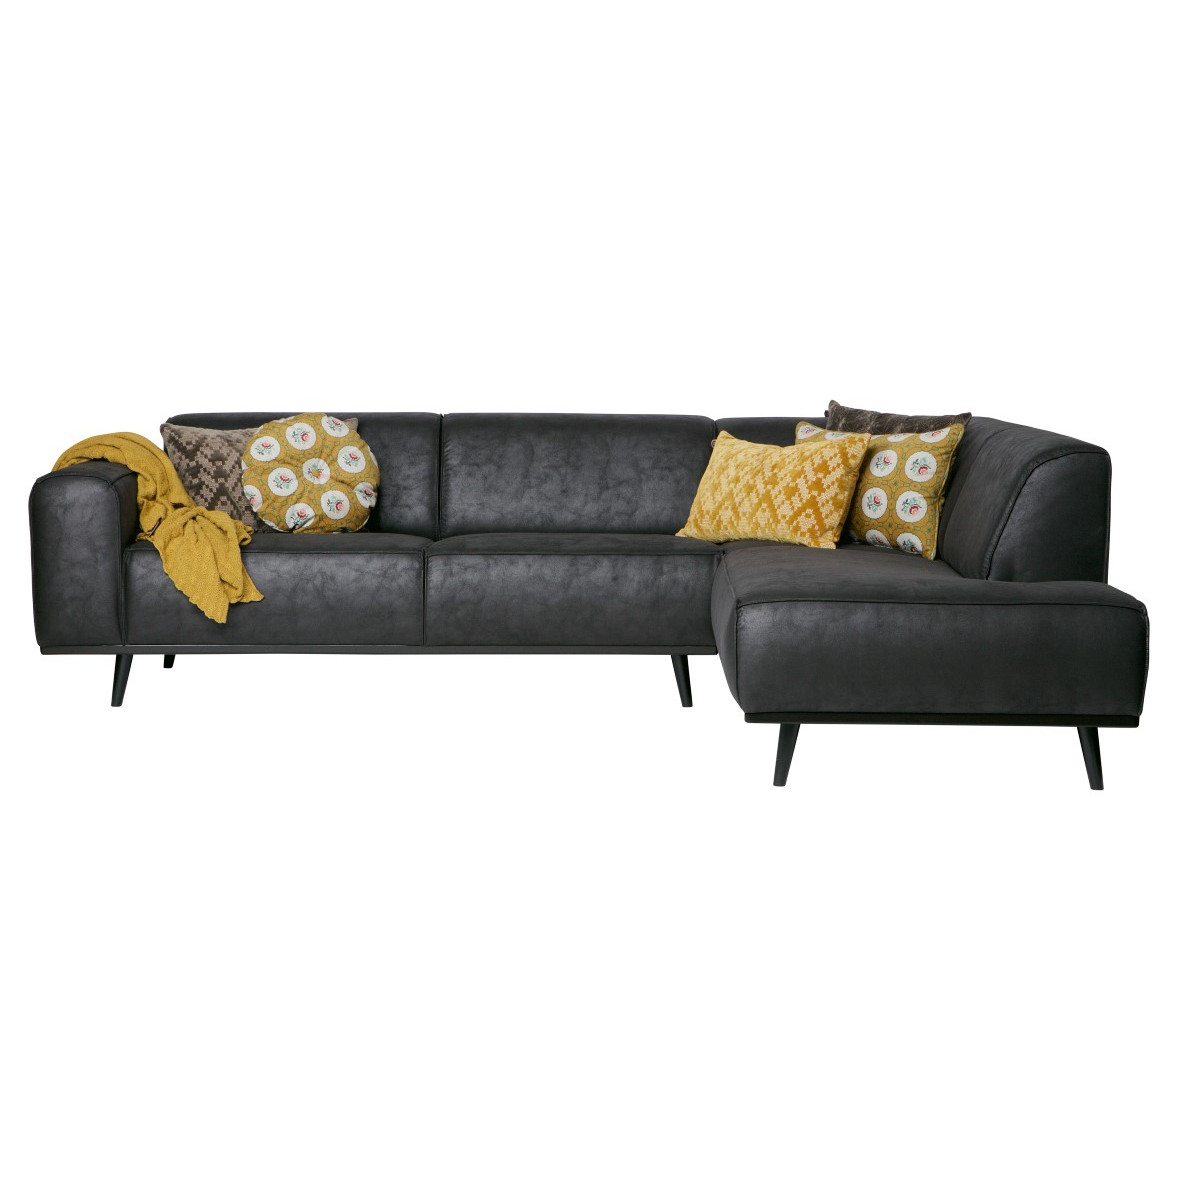 Corner Sofa Right Statement | Black